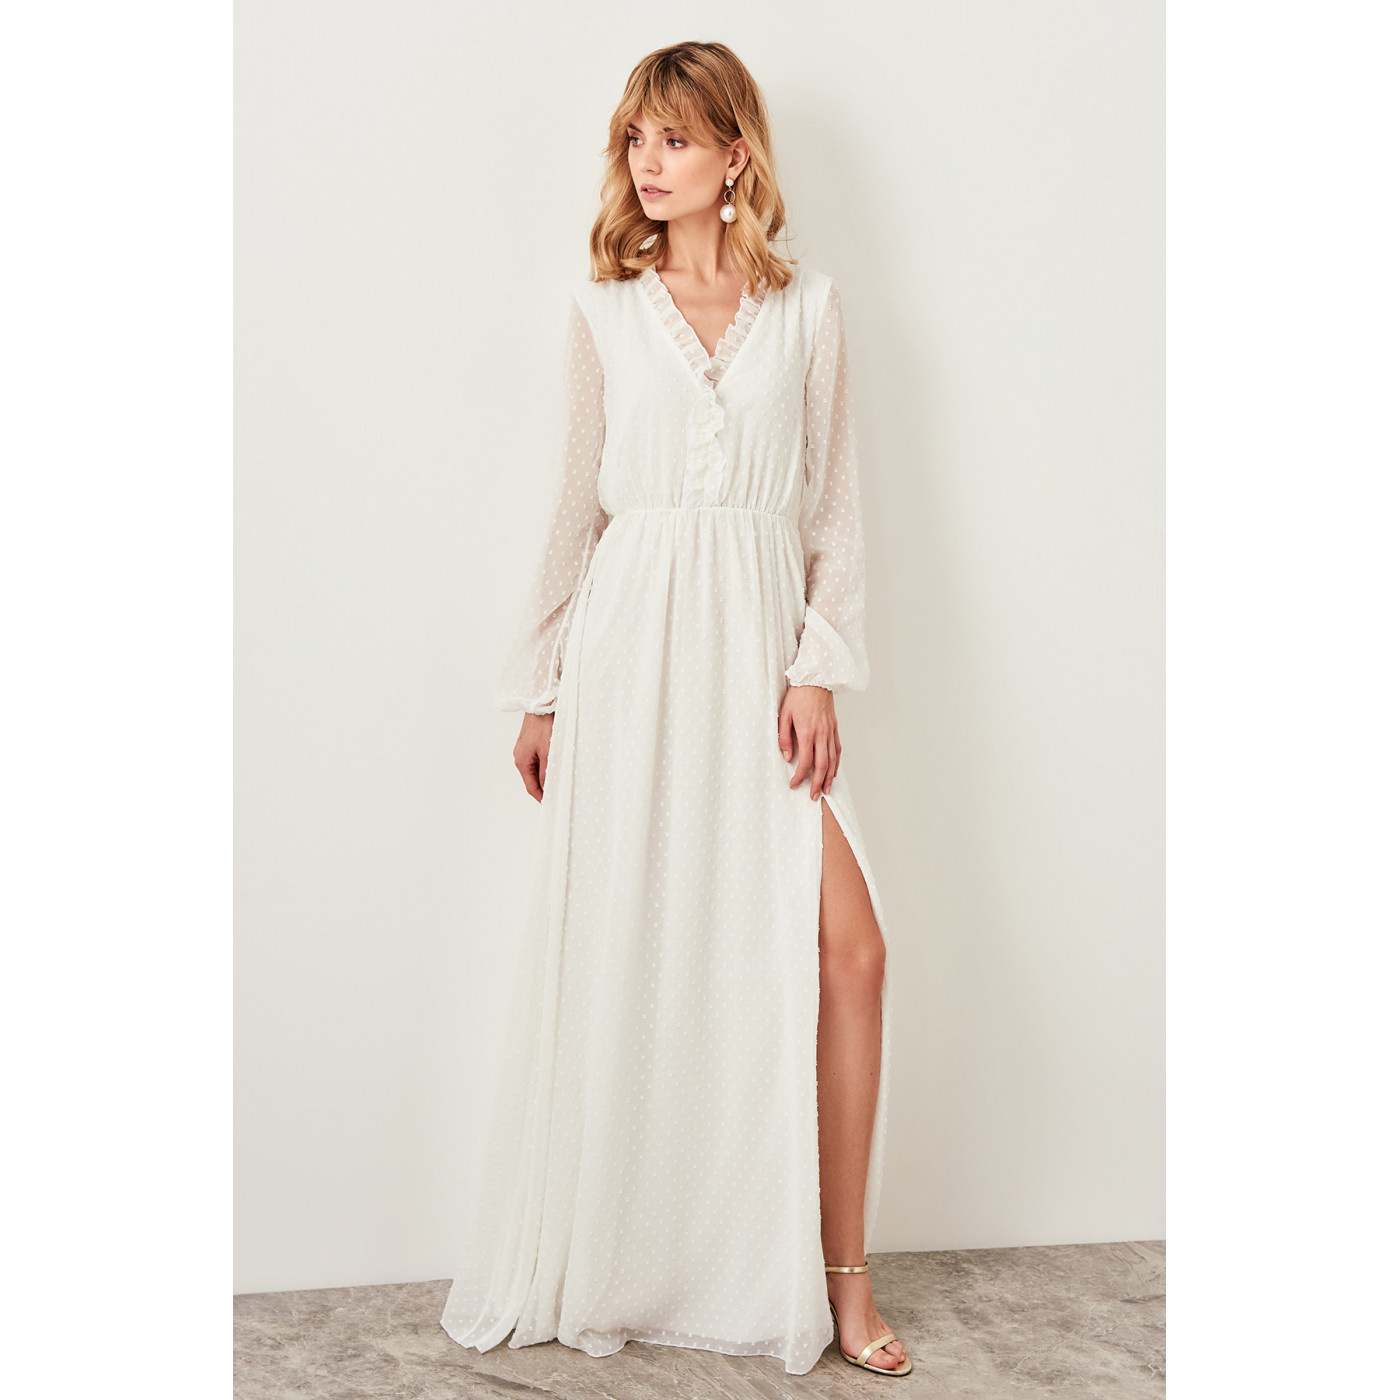 7098fcc79 Trendyol White Custom Fabric Ruffle Detail Dress White - Glami.cz